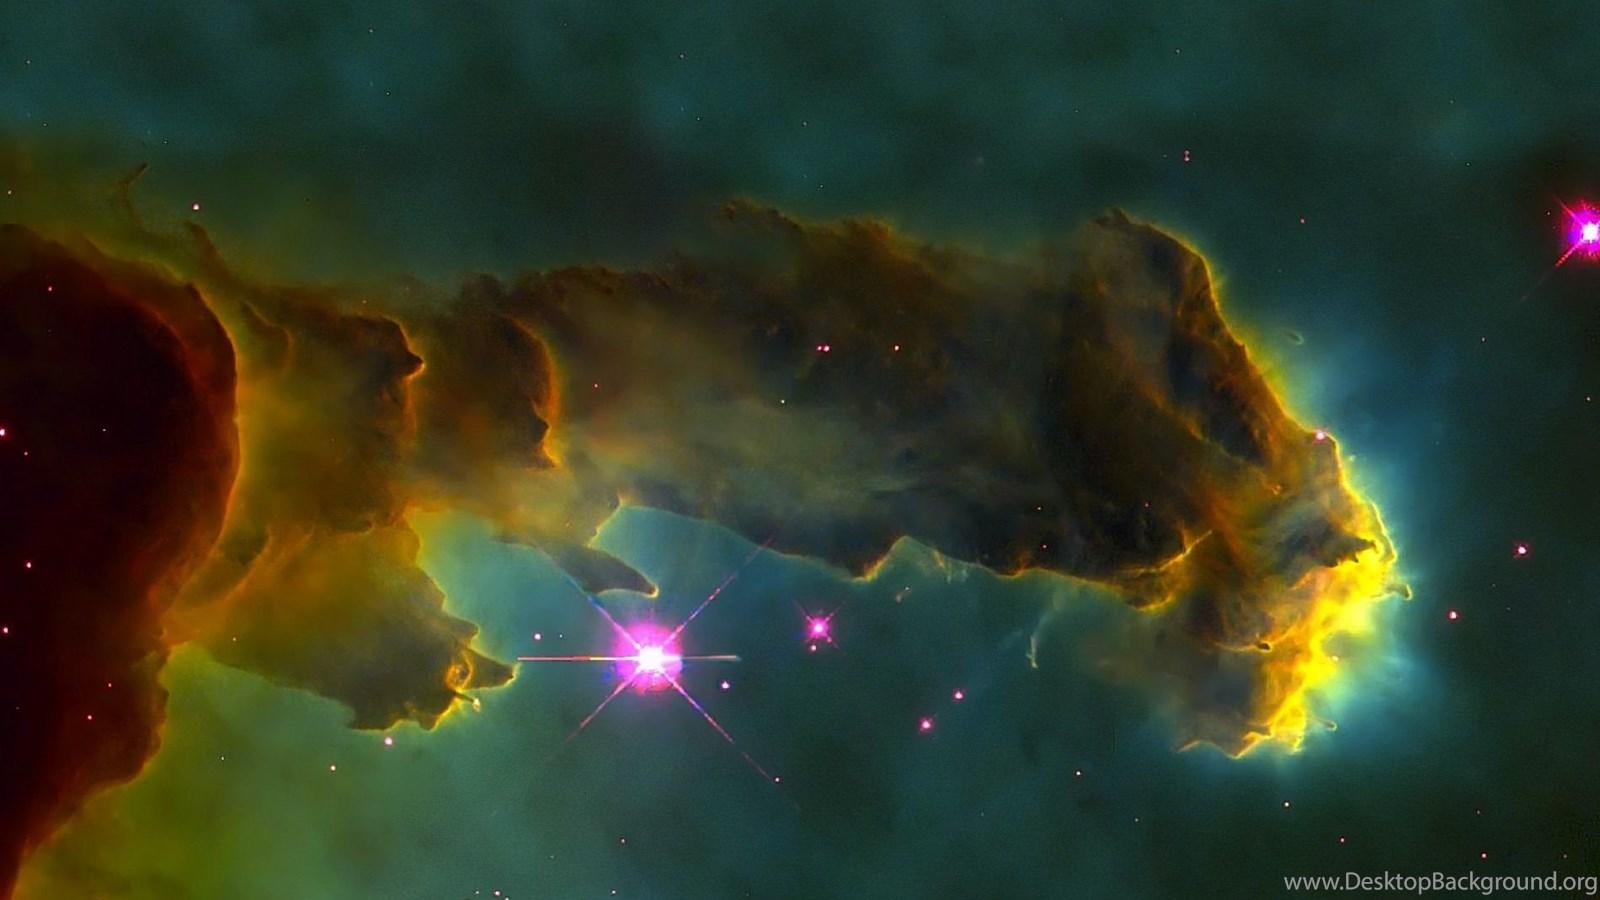 Eagle Nebula Hd Pics About Space Desktop Background